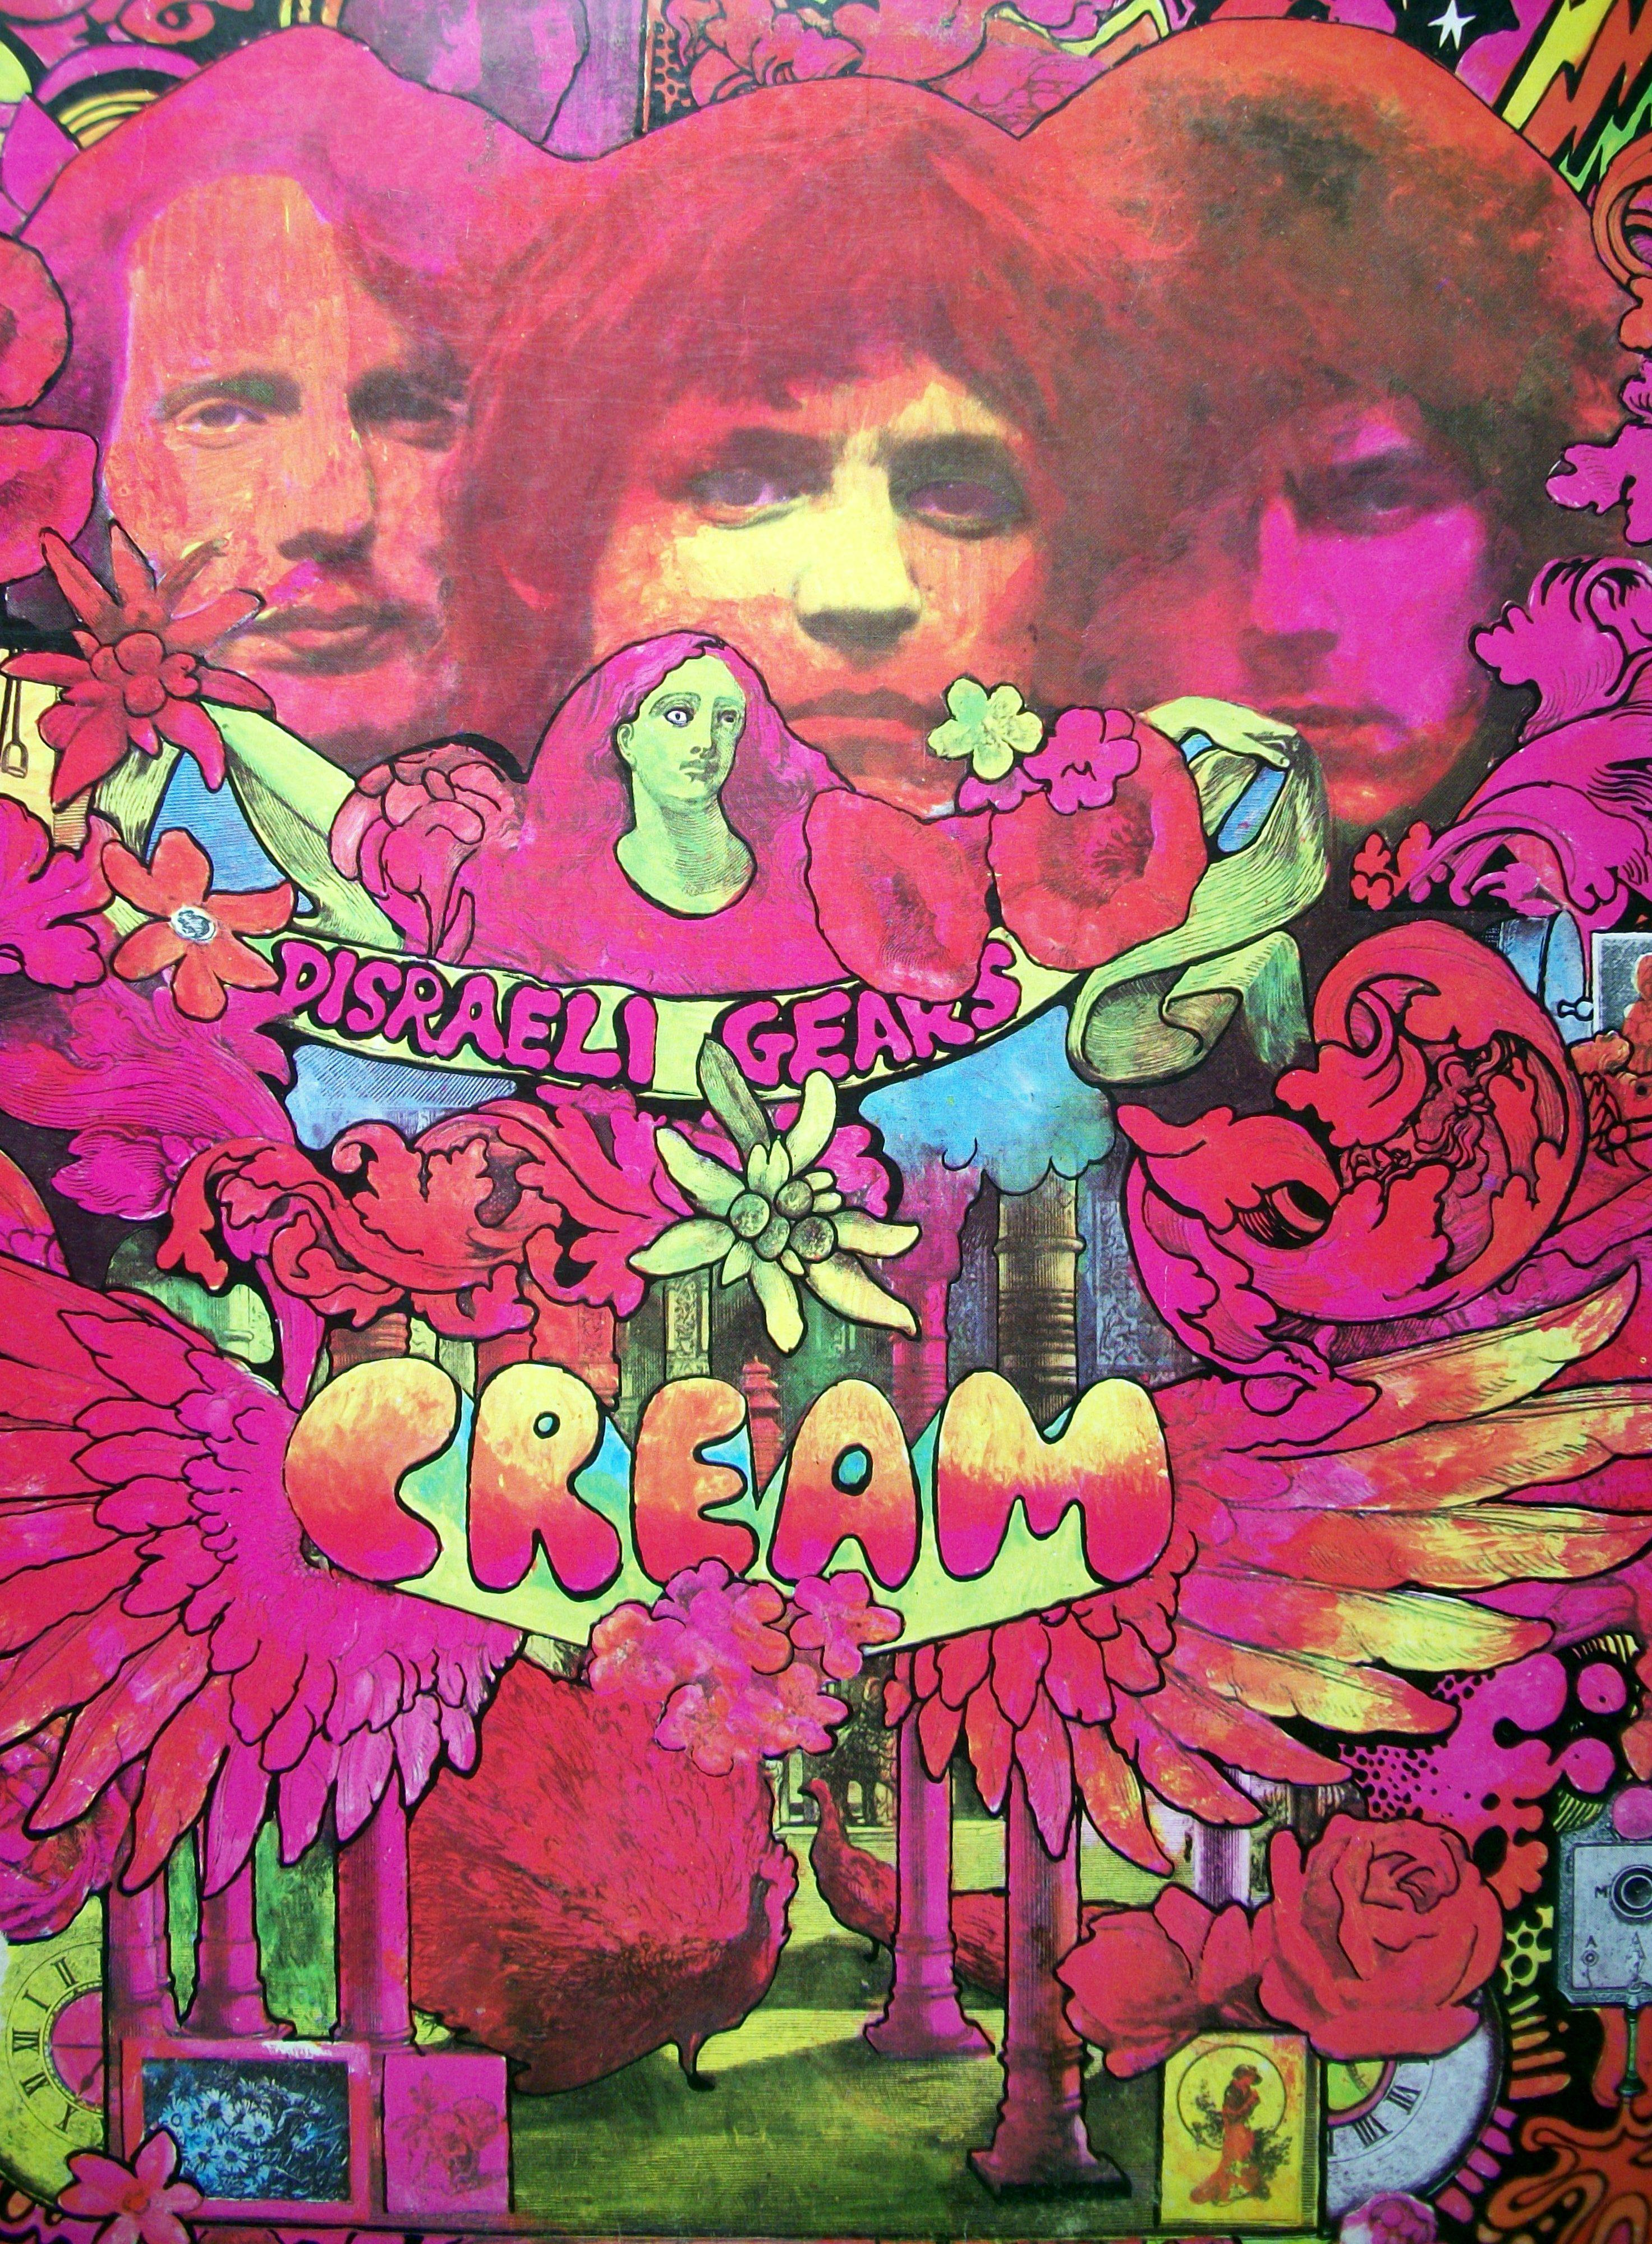 Sinister Vinyl Collection Cream Disraeli Gears 1967